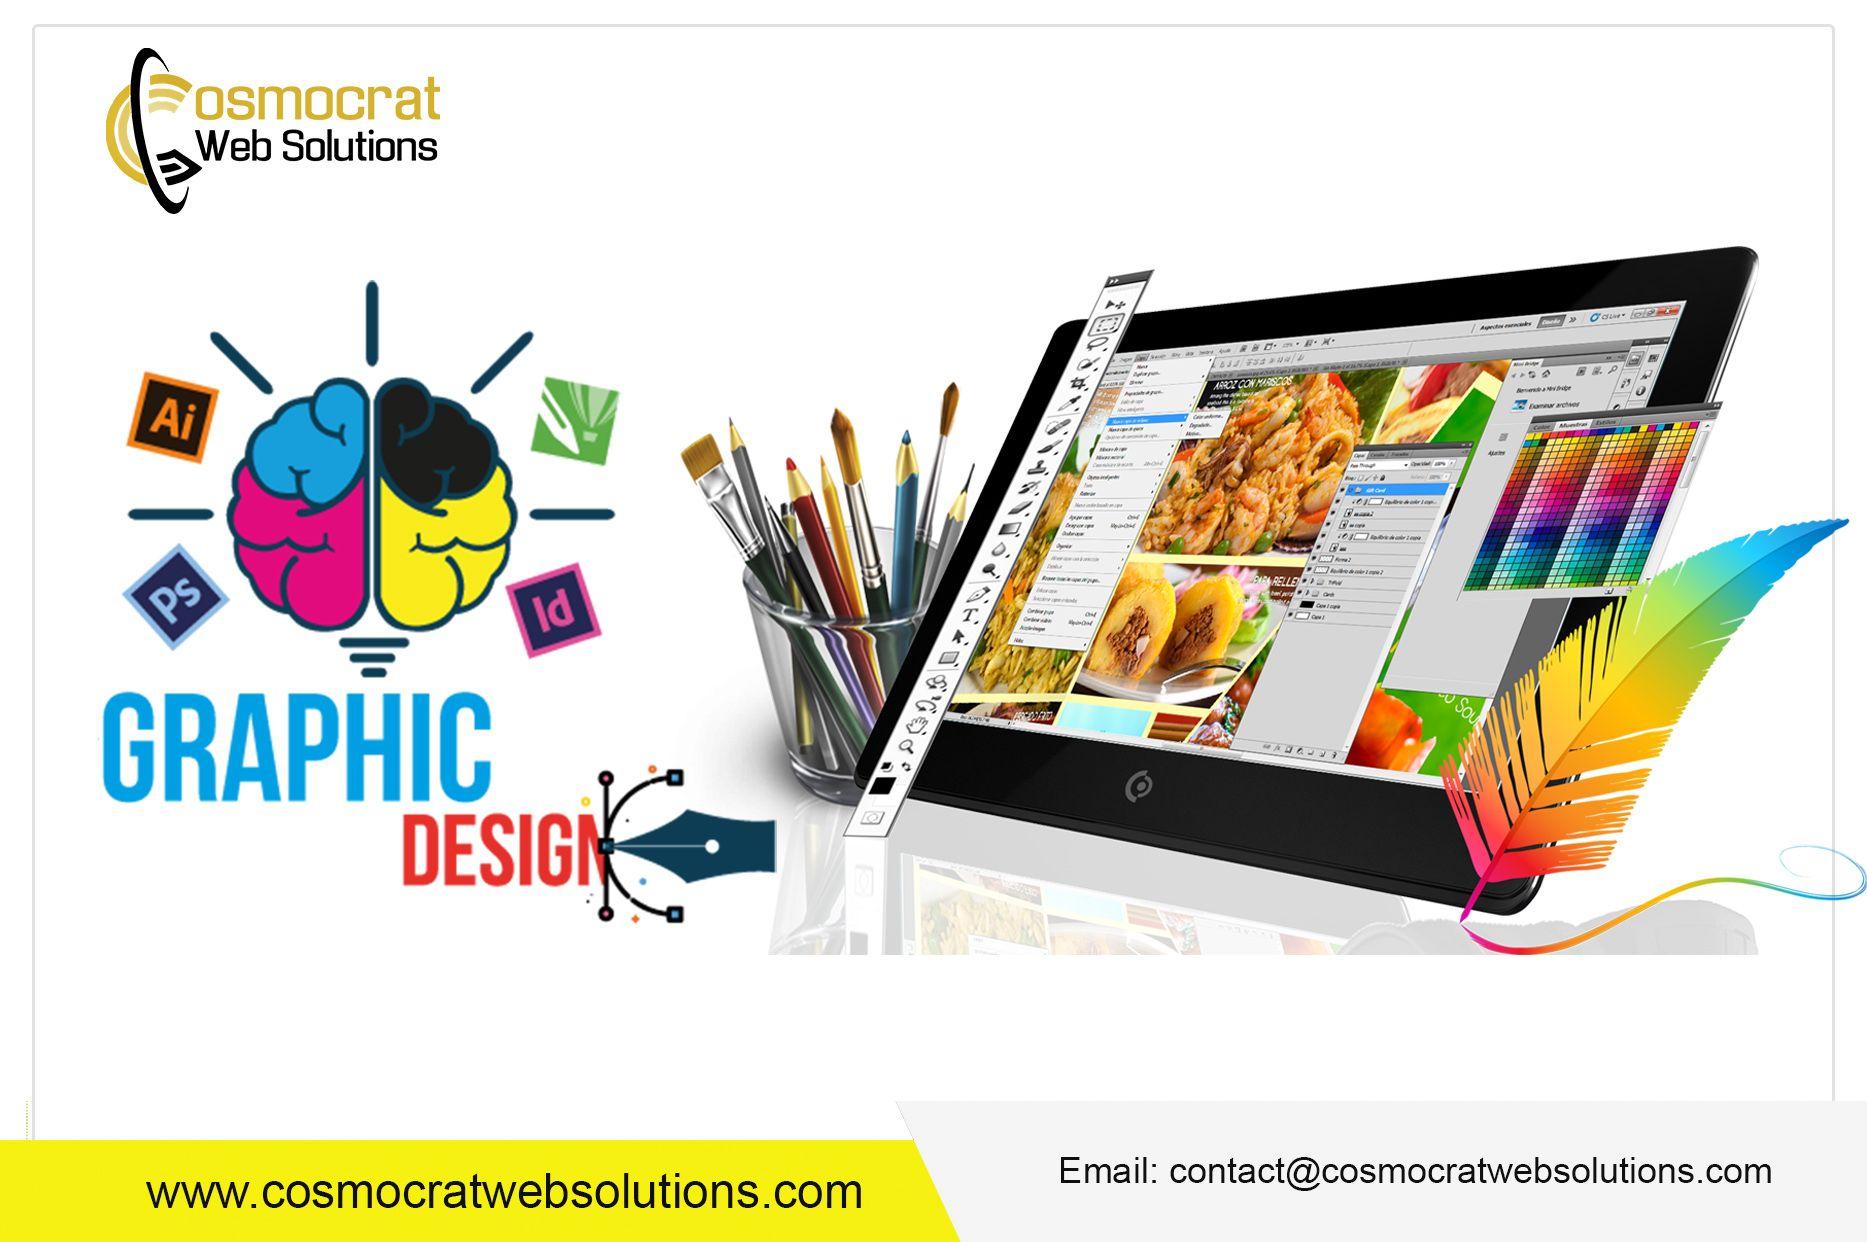 Graphic Designing Company In Australia Create Business Cards Website Design Services Graphic Design Company